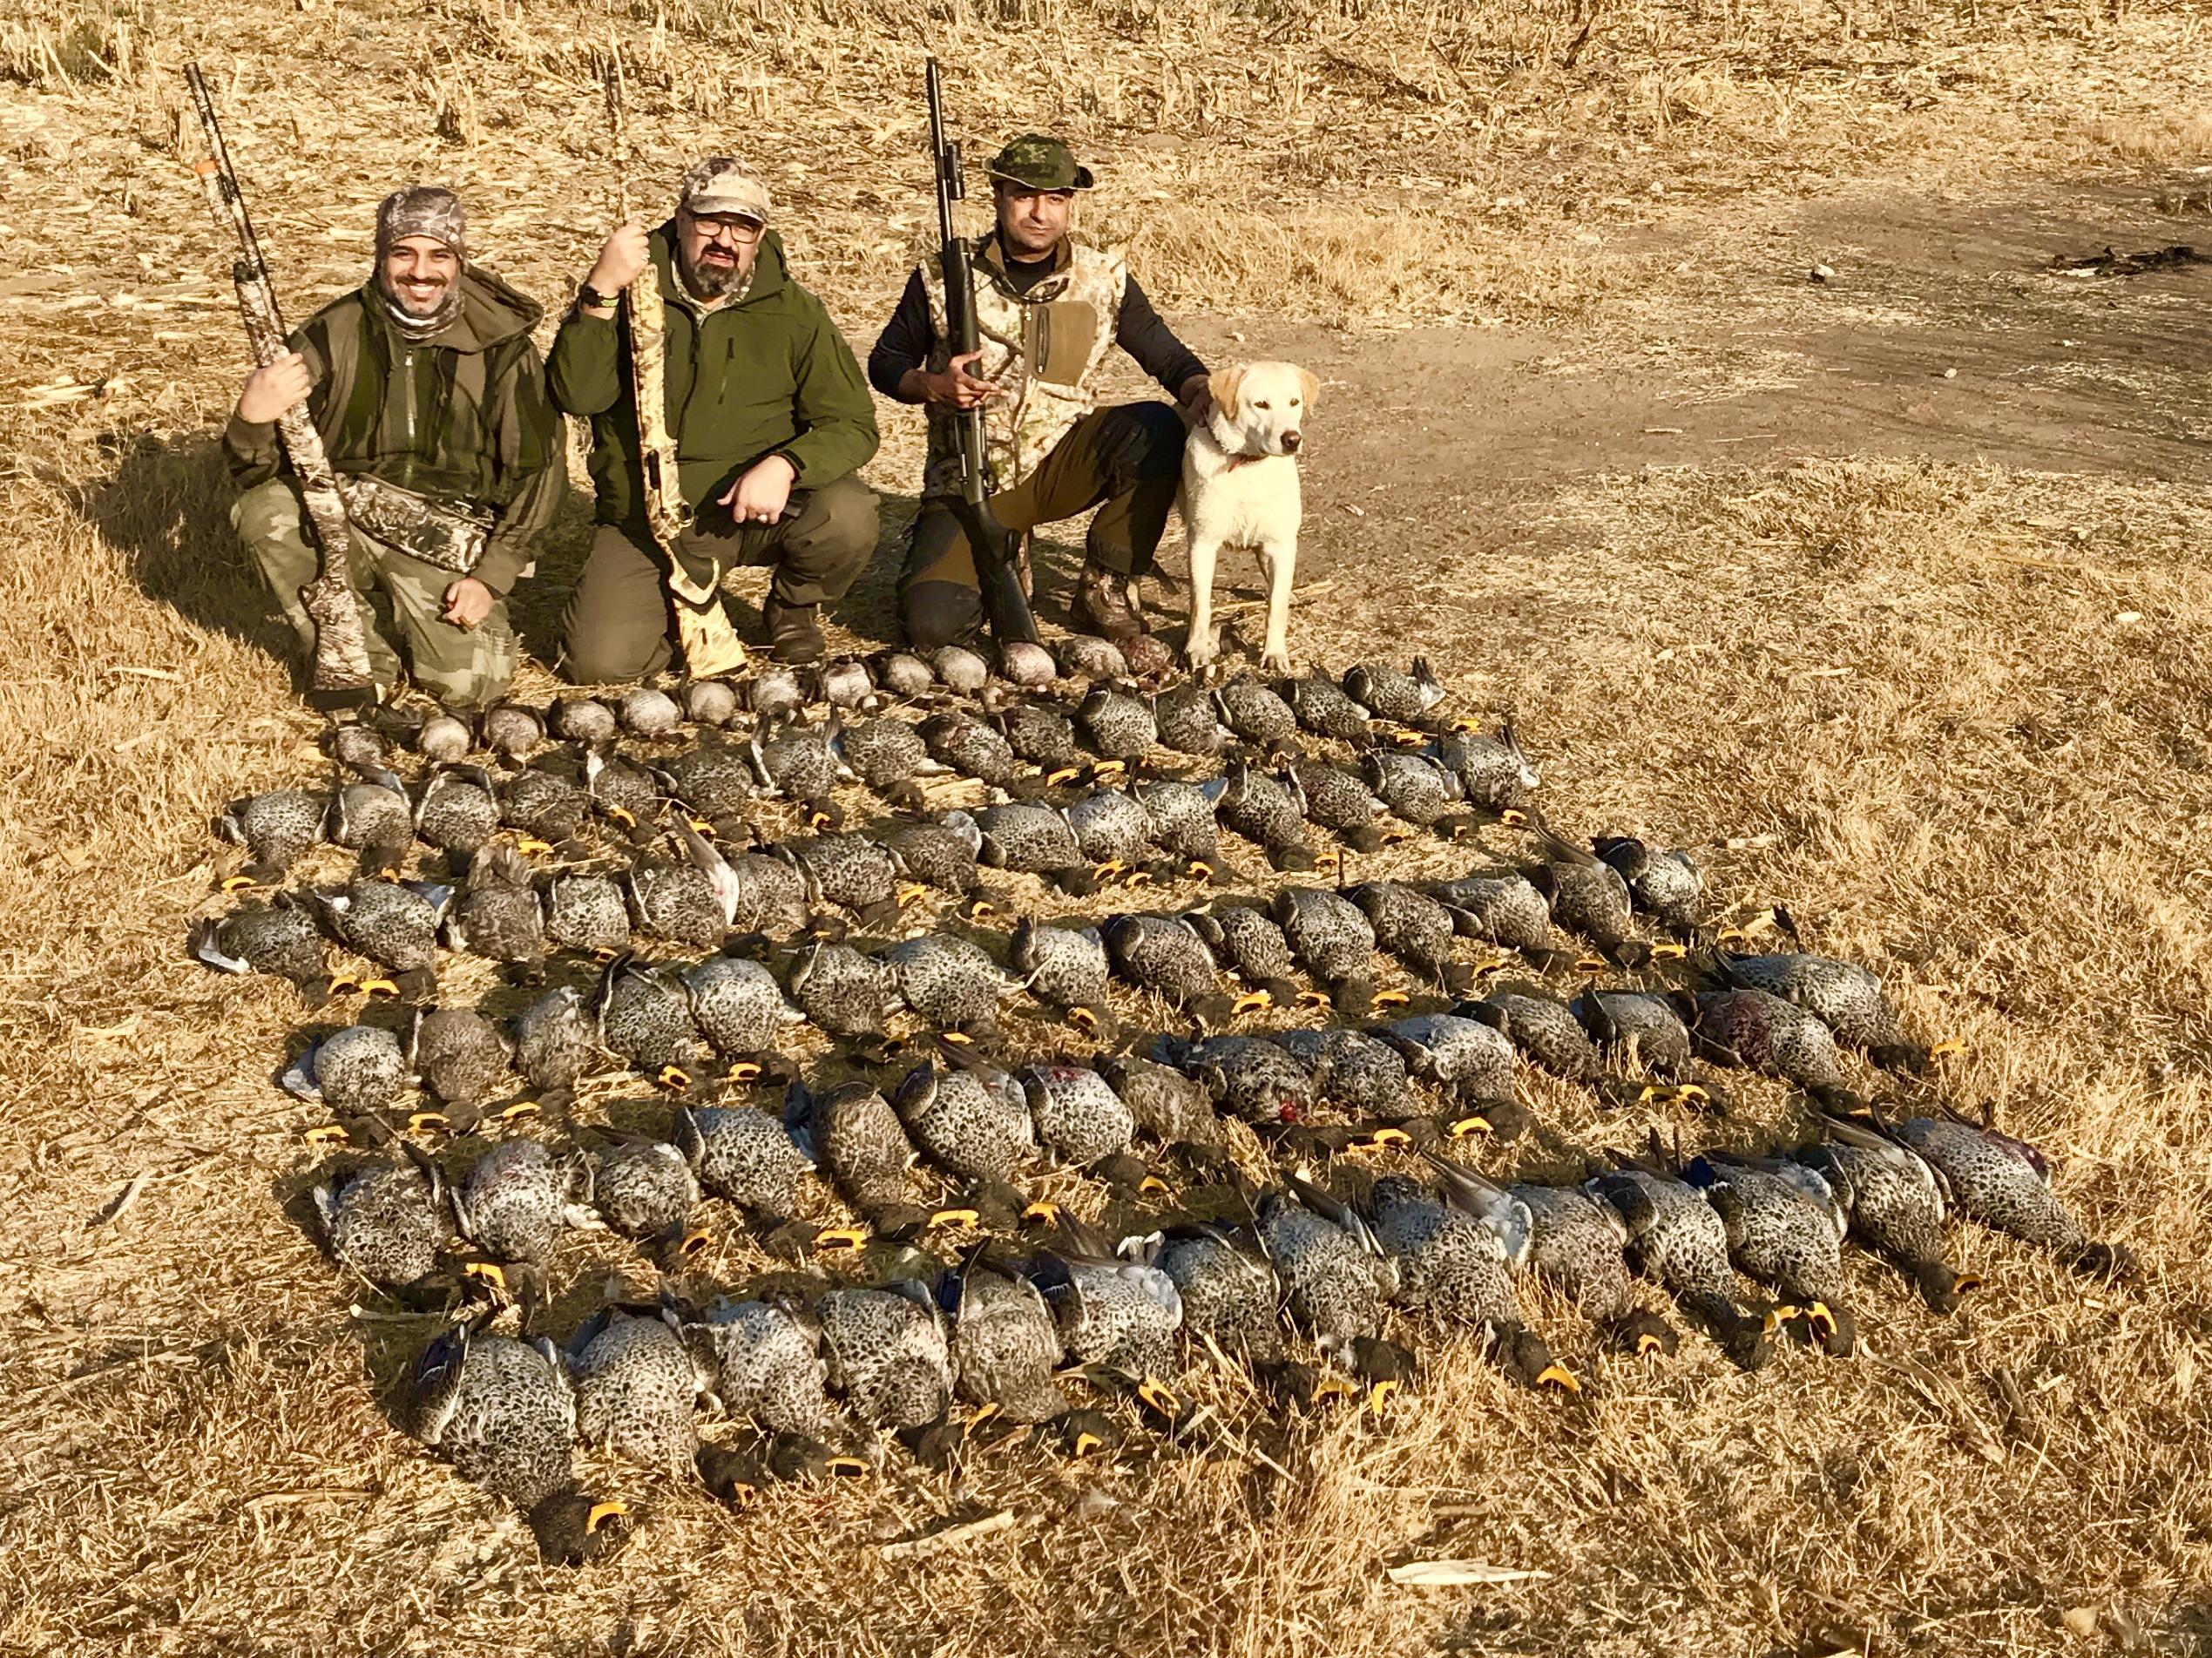 Umdende Hunting Safaris Ducks